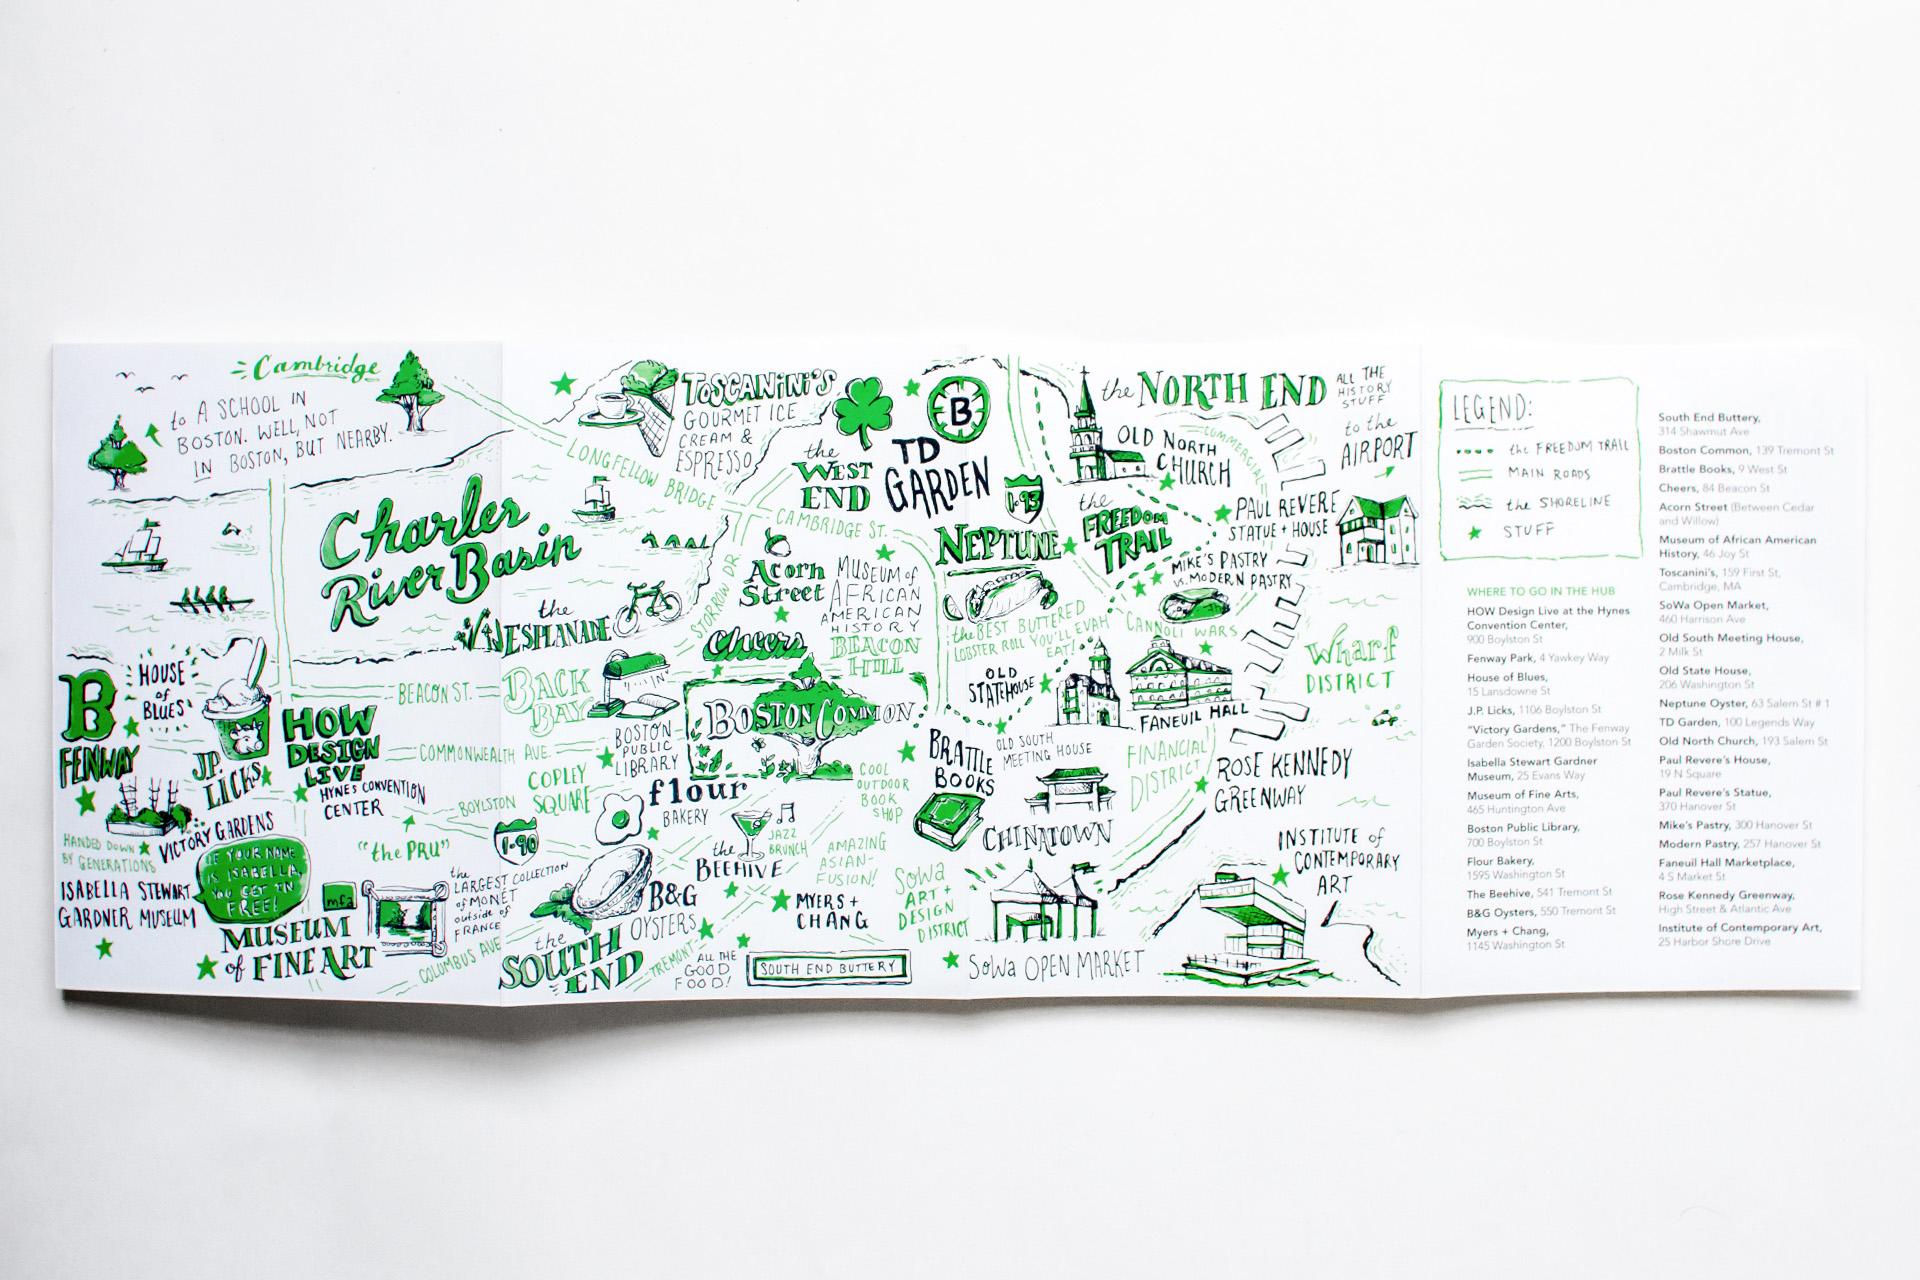 neenah presents boston full map and legend